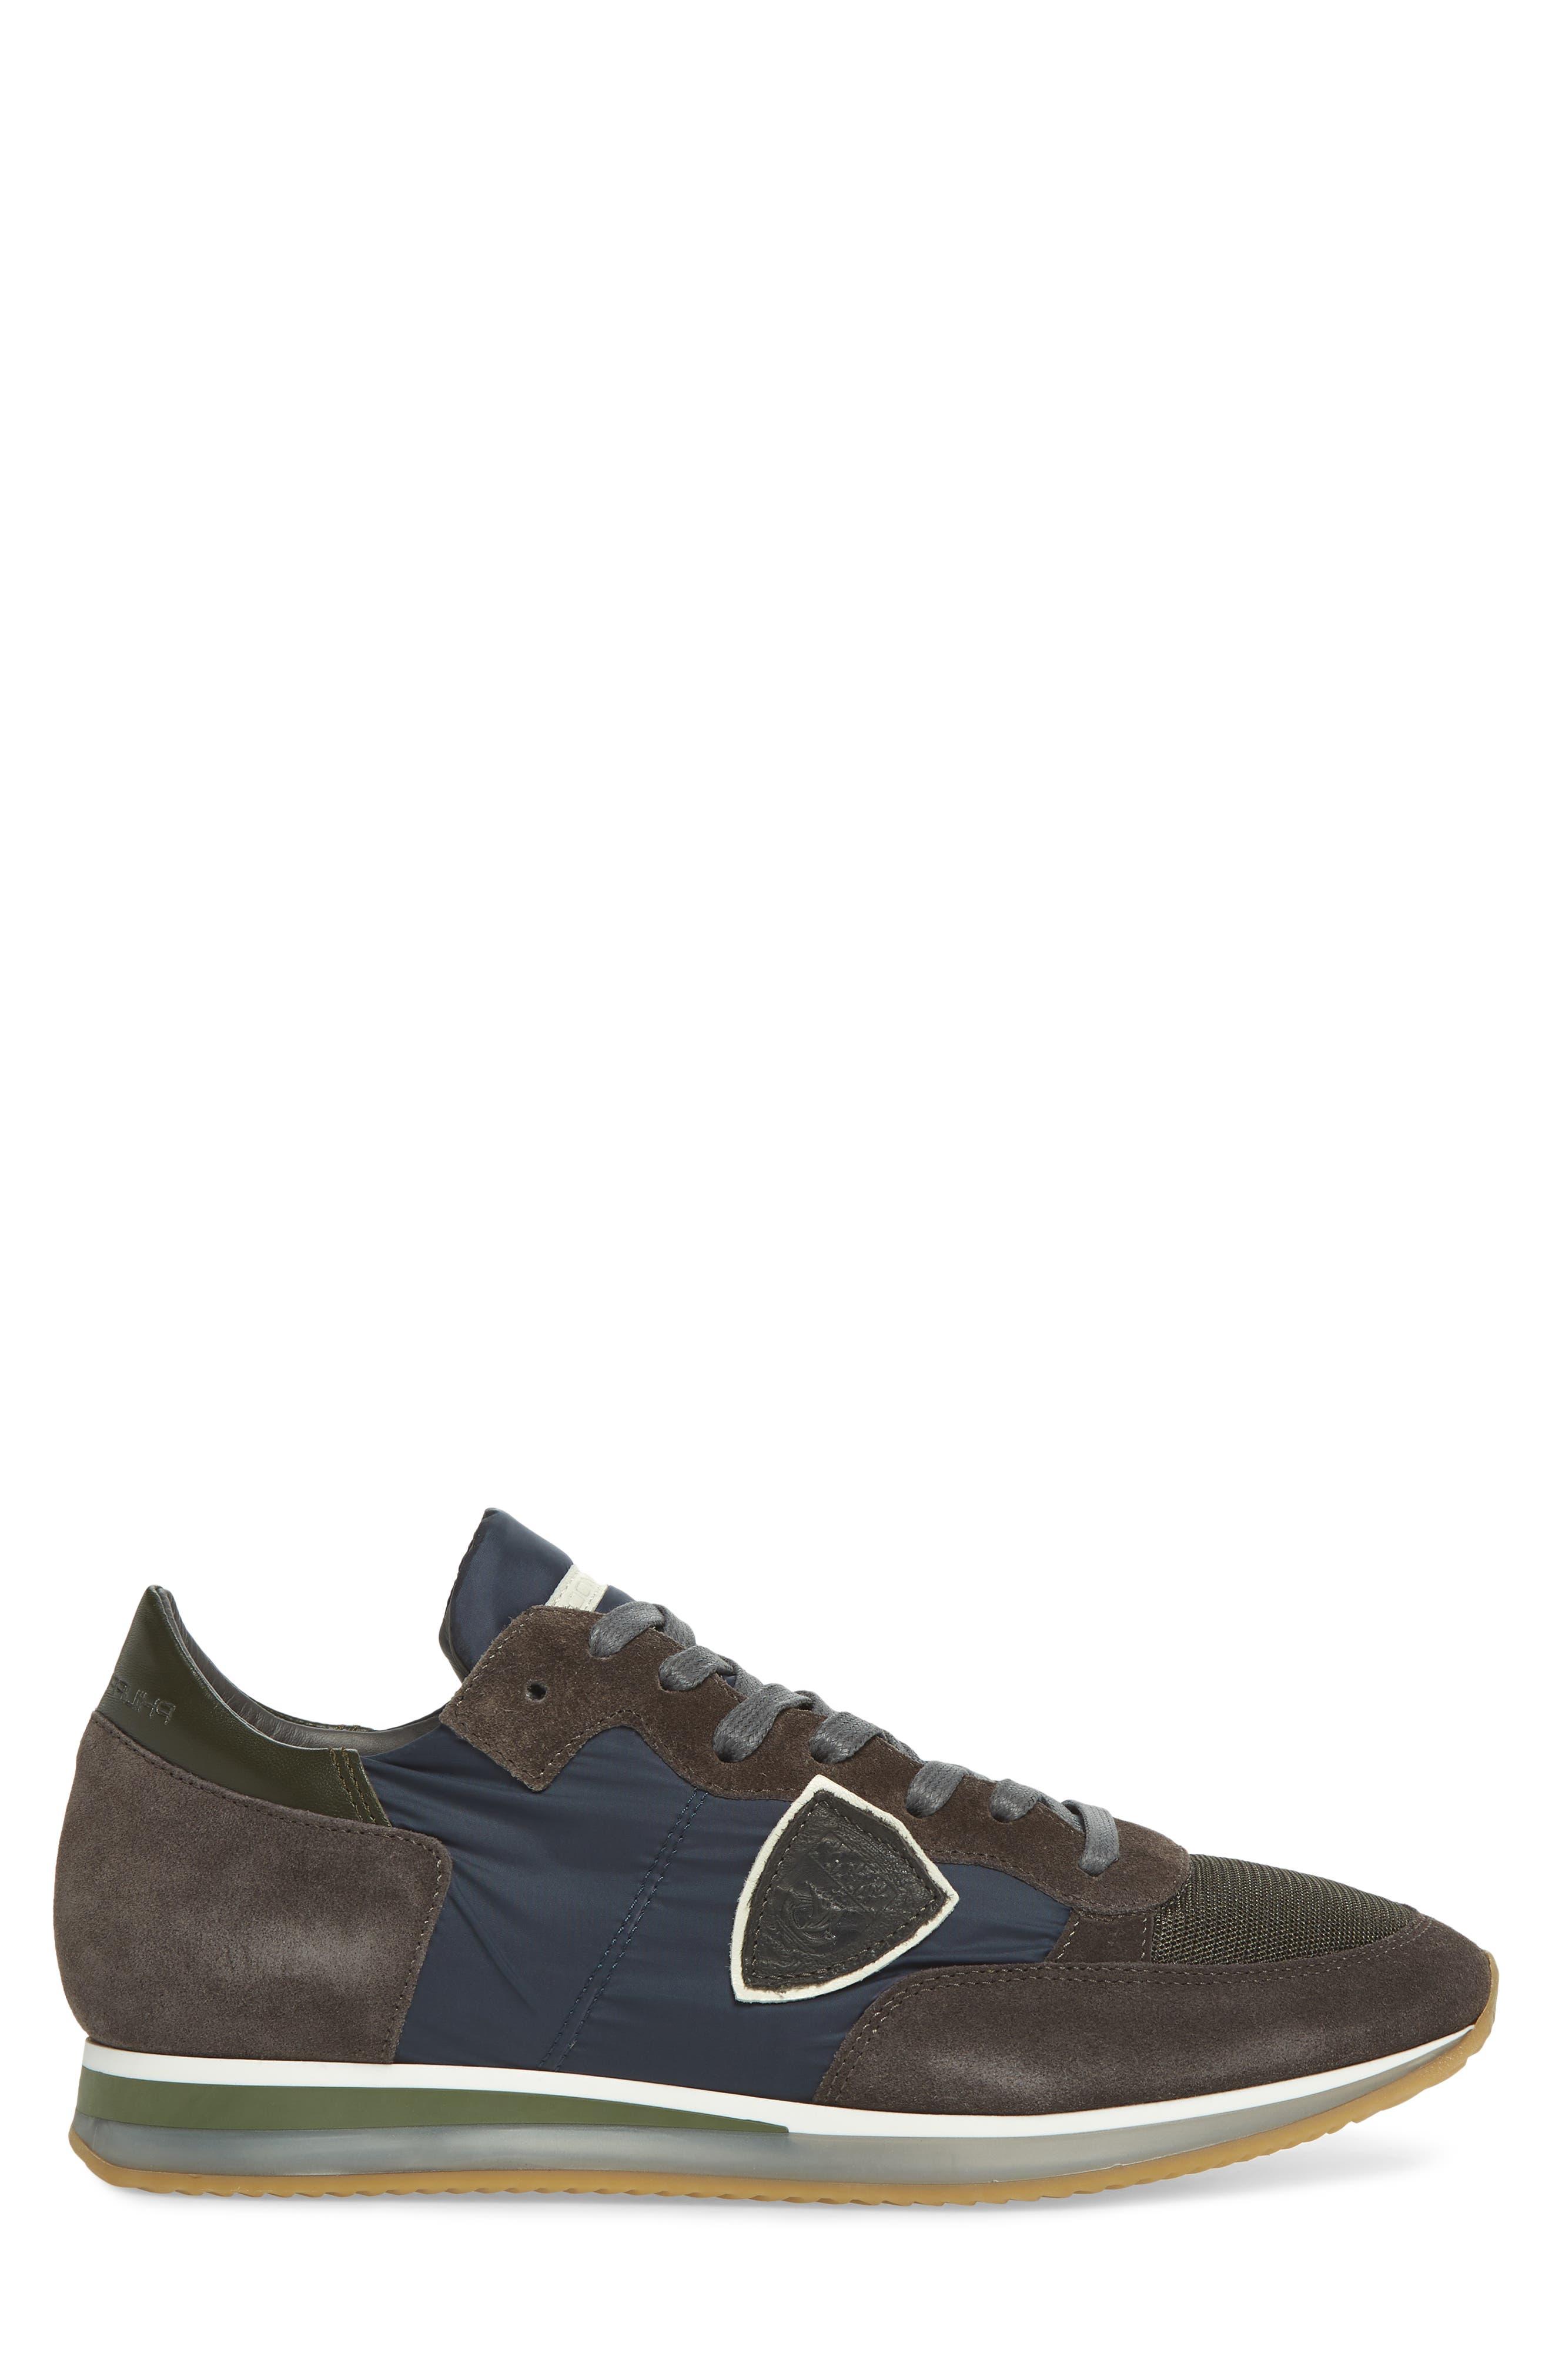 Tropez Low Top Sneaker,                             Alternate thumbnail 3, color,                             BLUE/ GREY